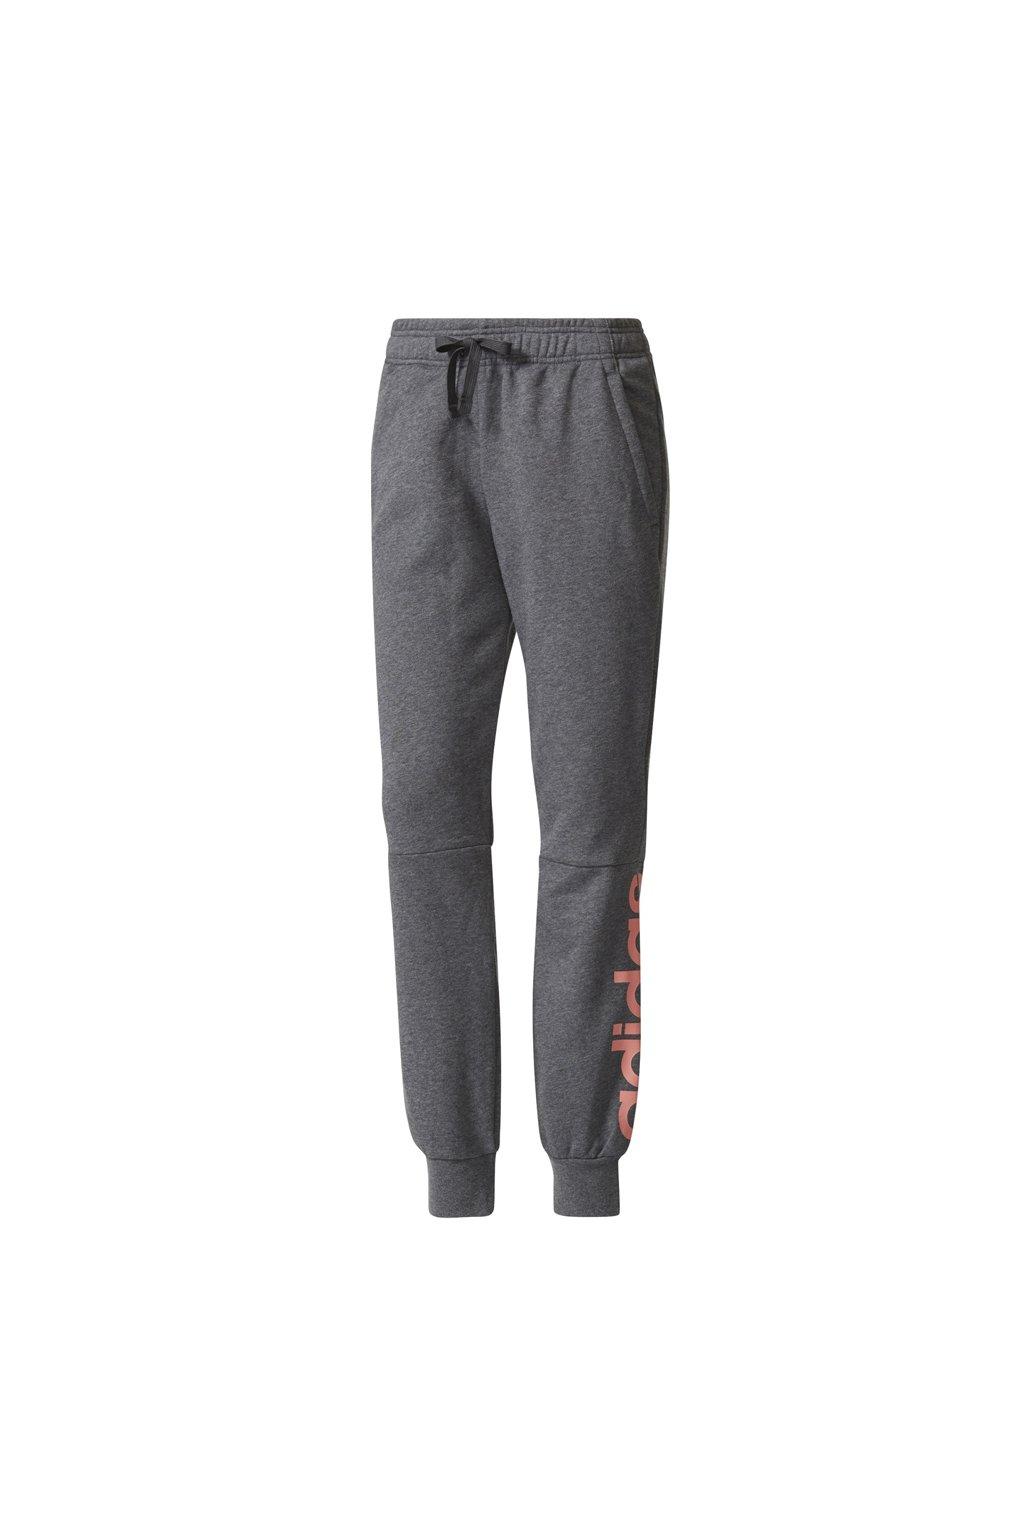 Dámske nohavice Adidas Essentials Lineární sivé BR2530